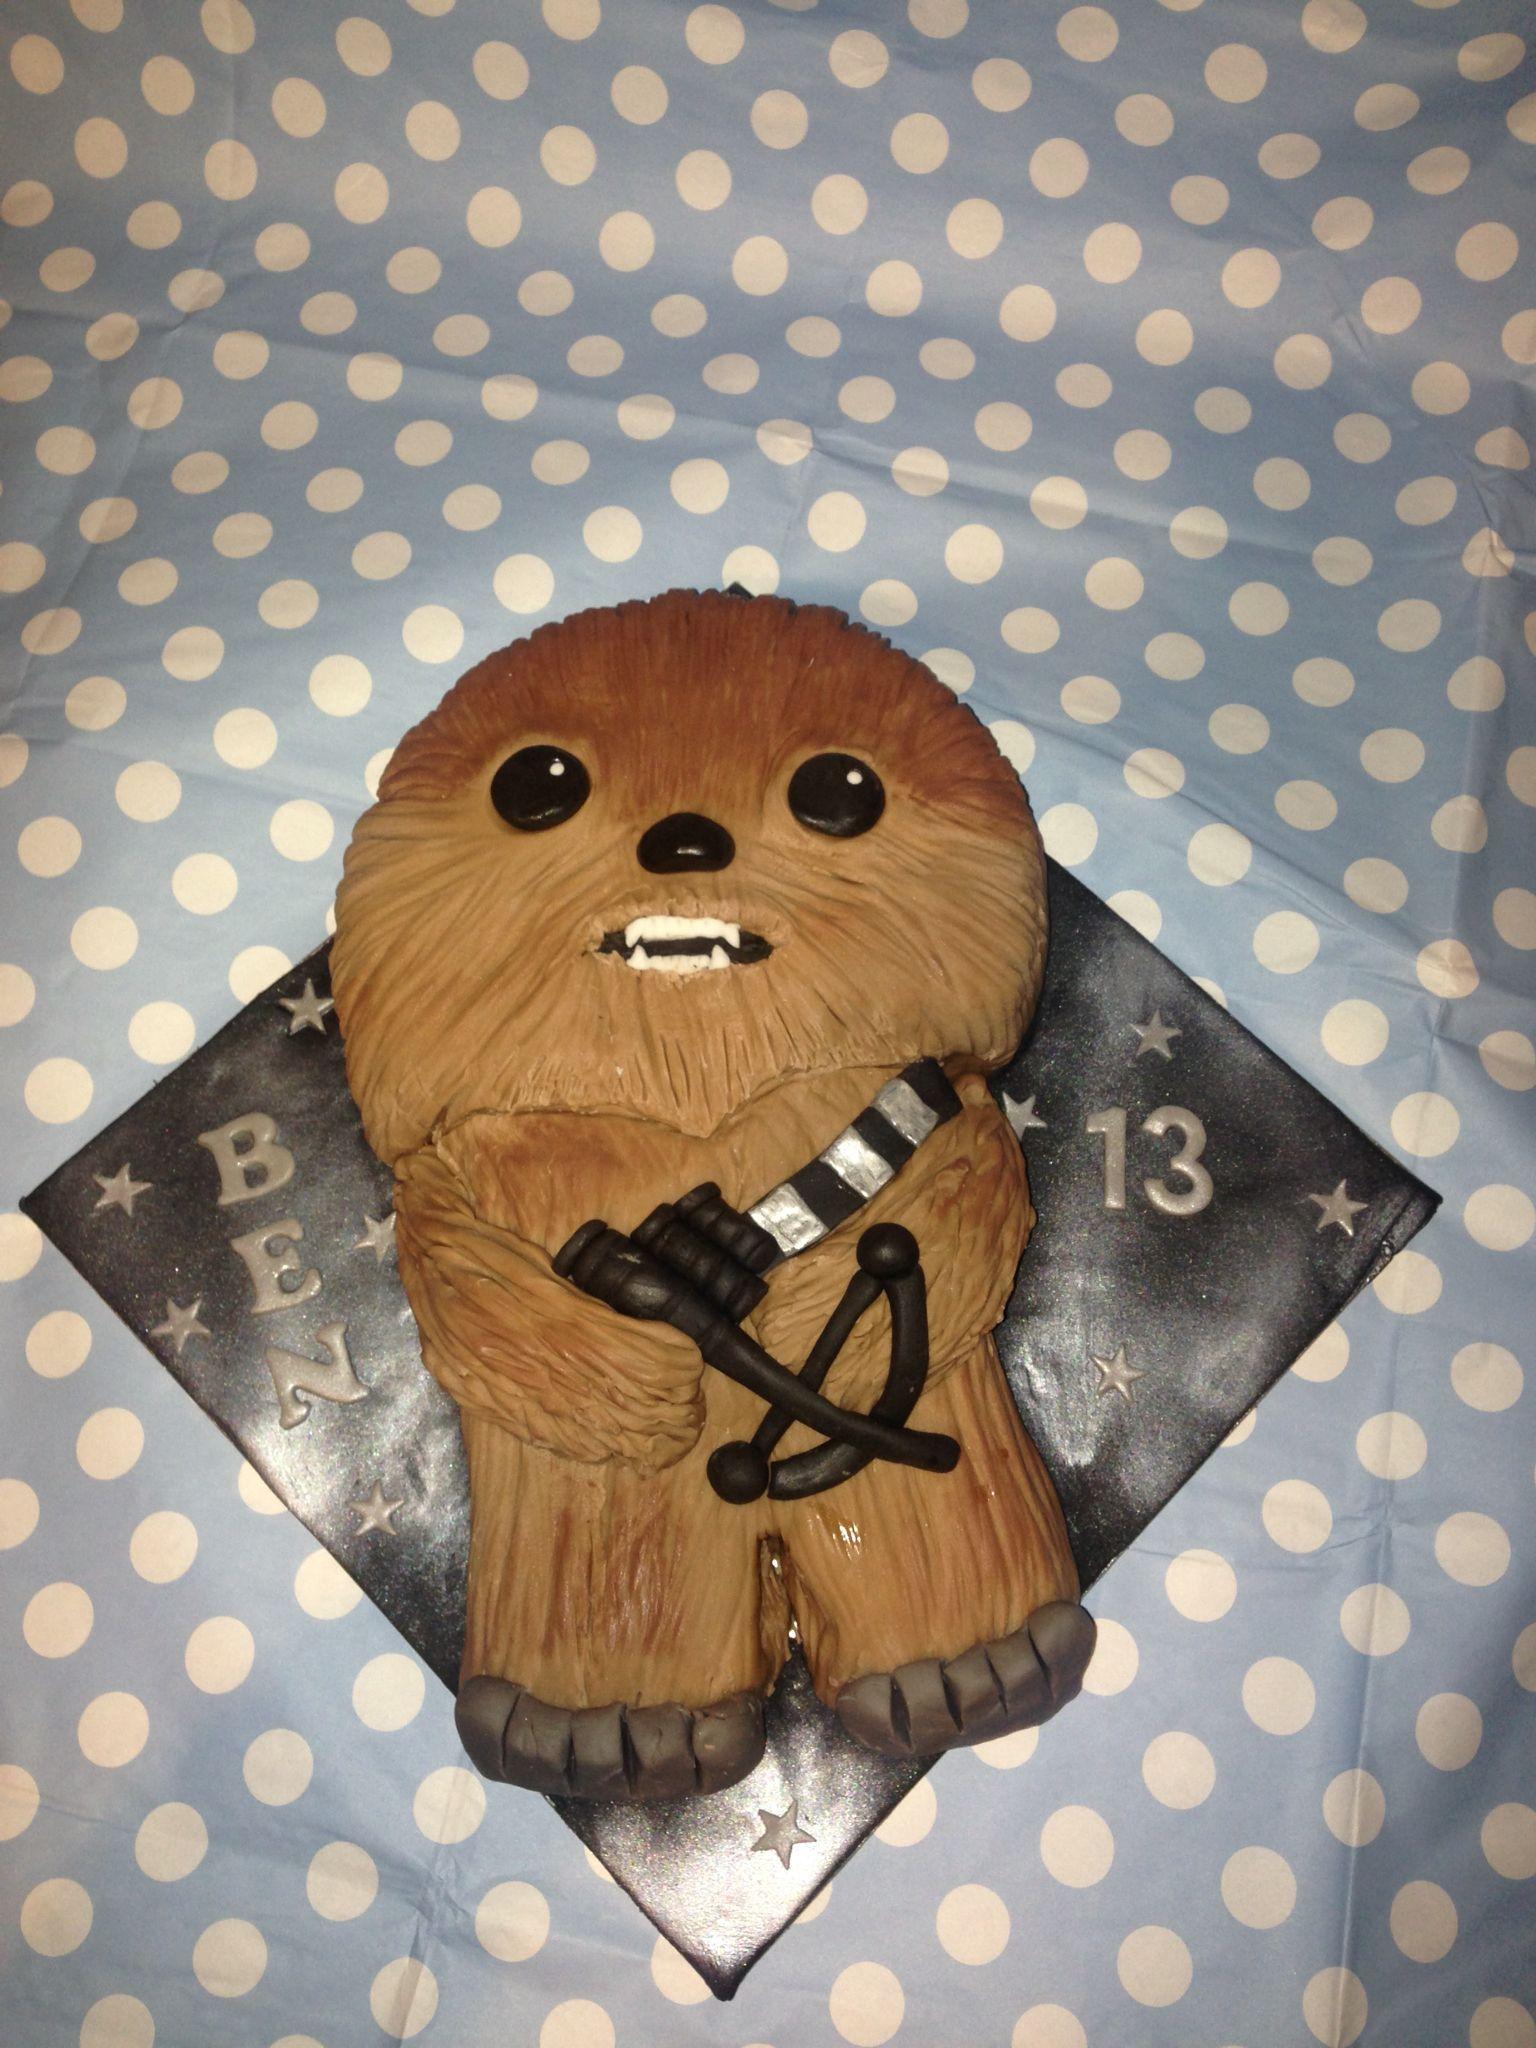 Chewbacca funko pop cake chewbacca cake star wars party